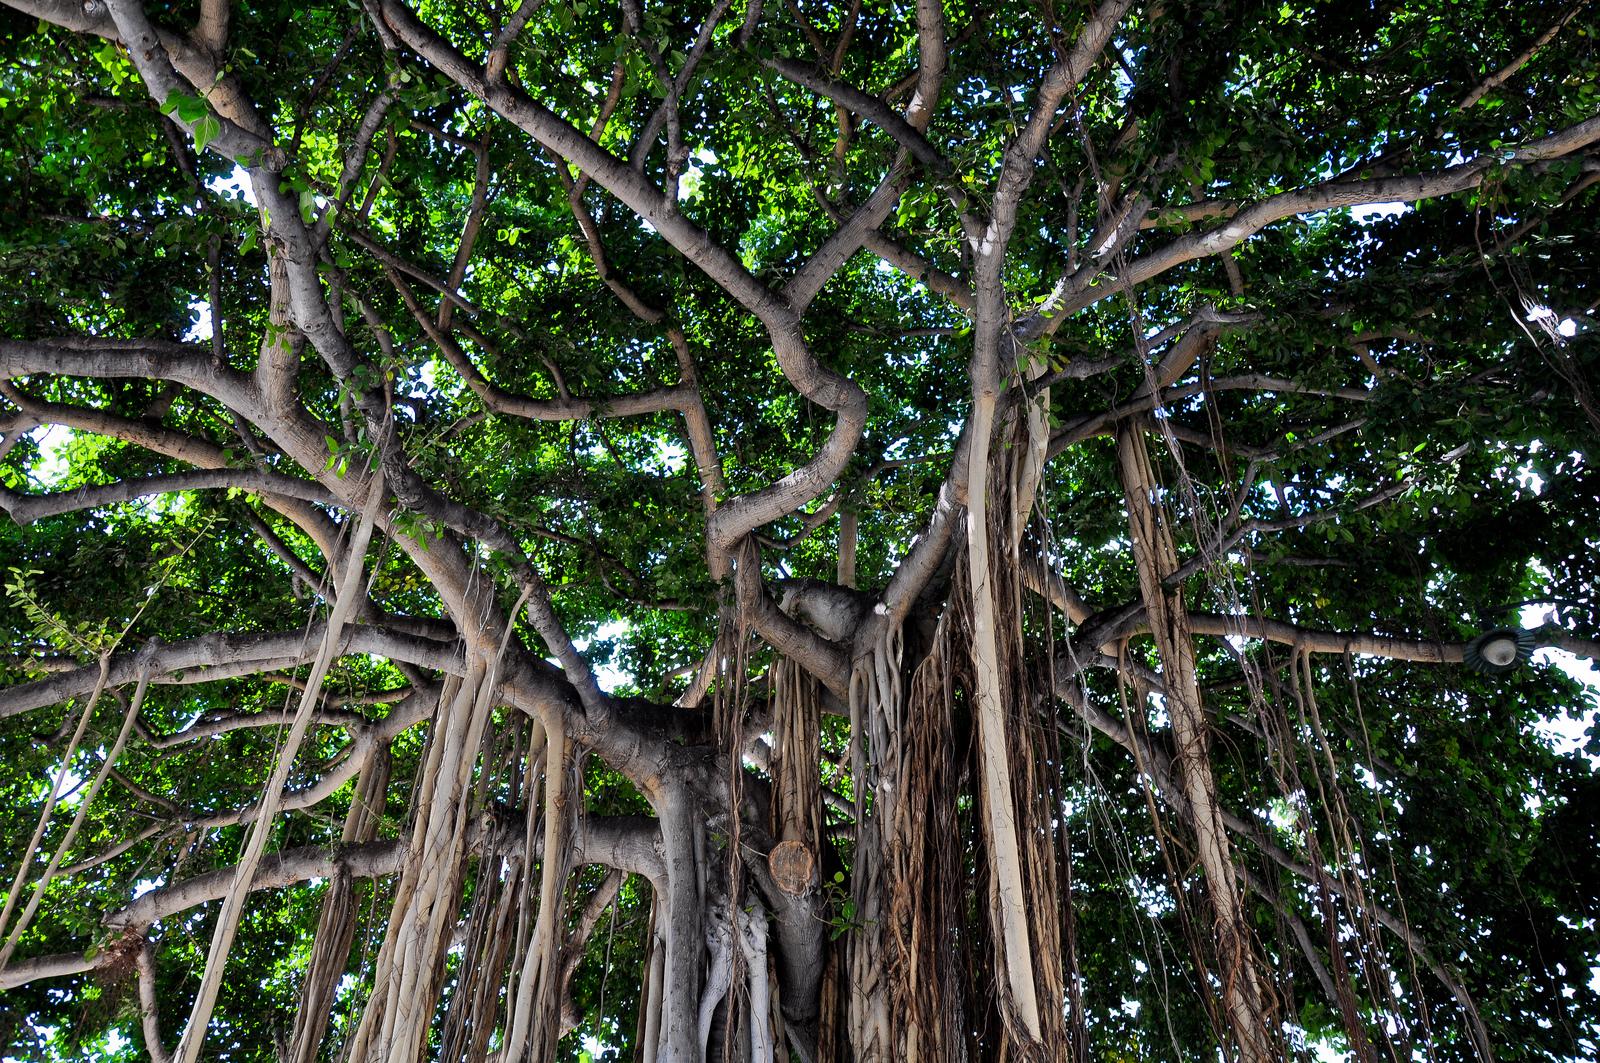 Banyan tree | MyConfinedSpace